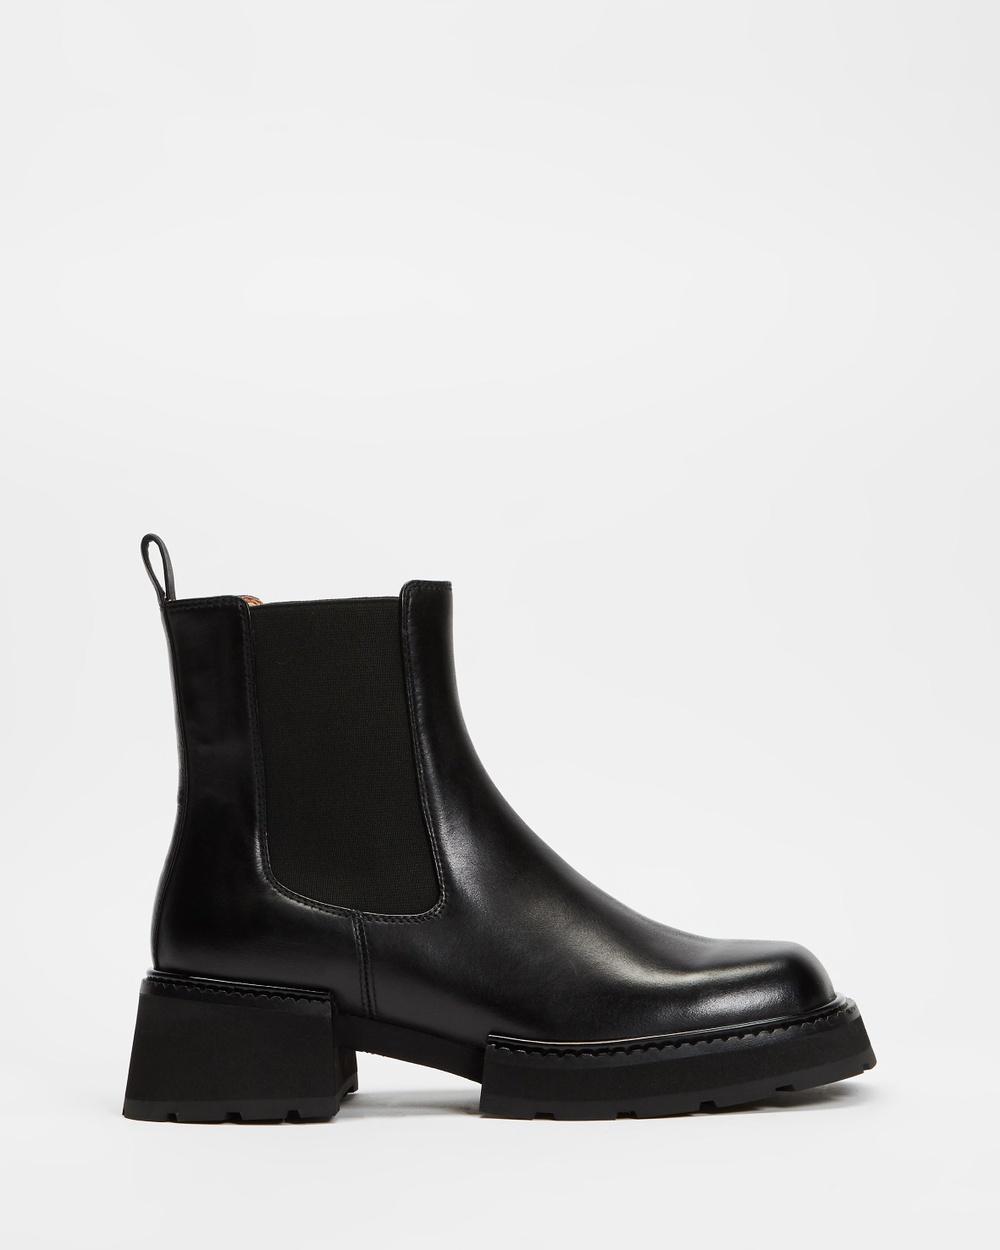 Alias Mae Ciara Boots Black Burnished